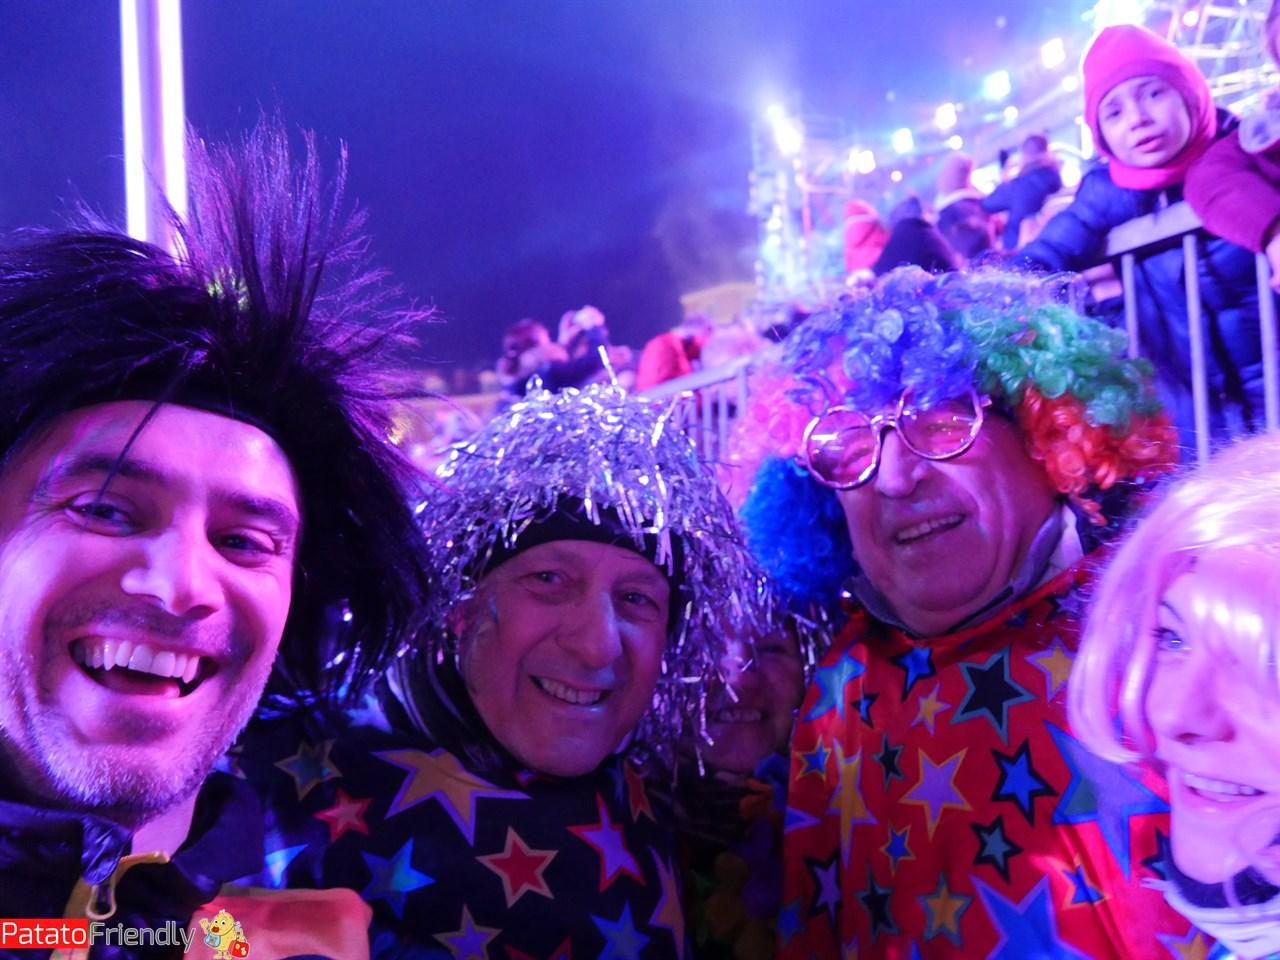 [cml_media_alt id='13593']Il Carnevale di Nizza coi bimbi - in maschera[/cml_media_alt]